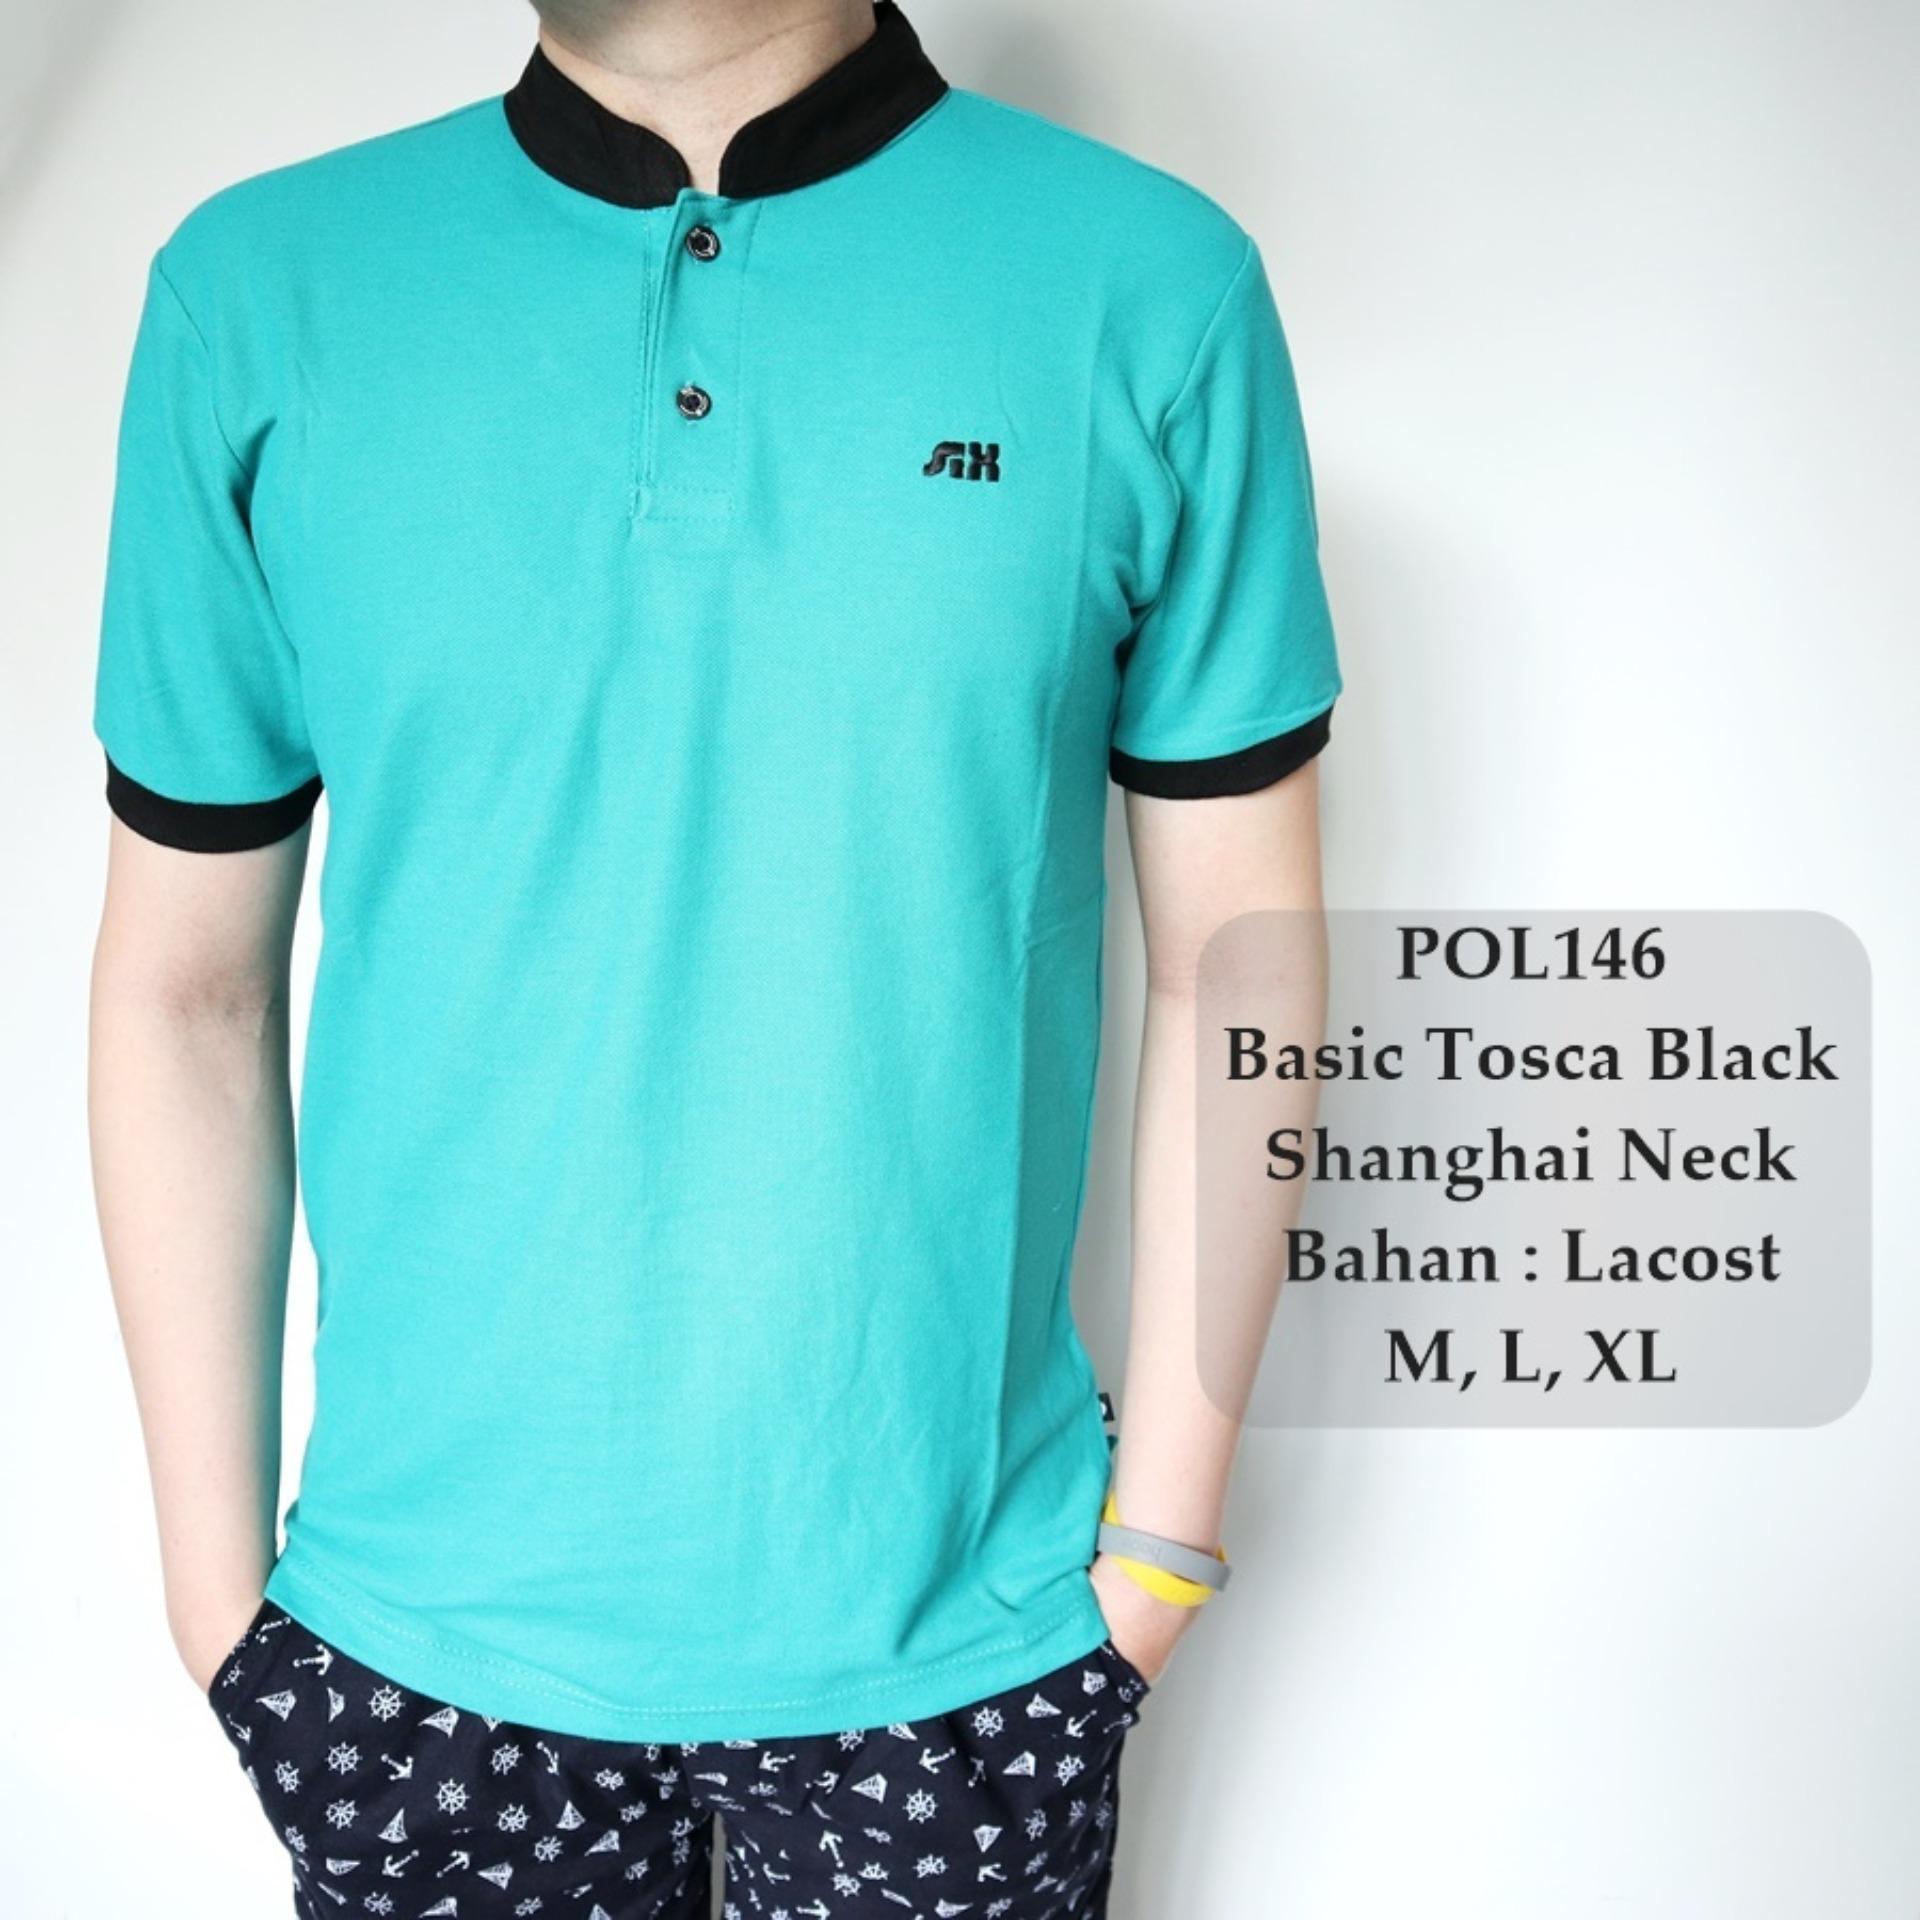 Rp 75.000. GFS Kaos Berkerah Polo Cowok Style Basic Tosca Black Shanghai Neck - 146IDR75000